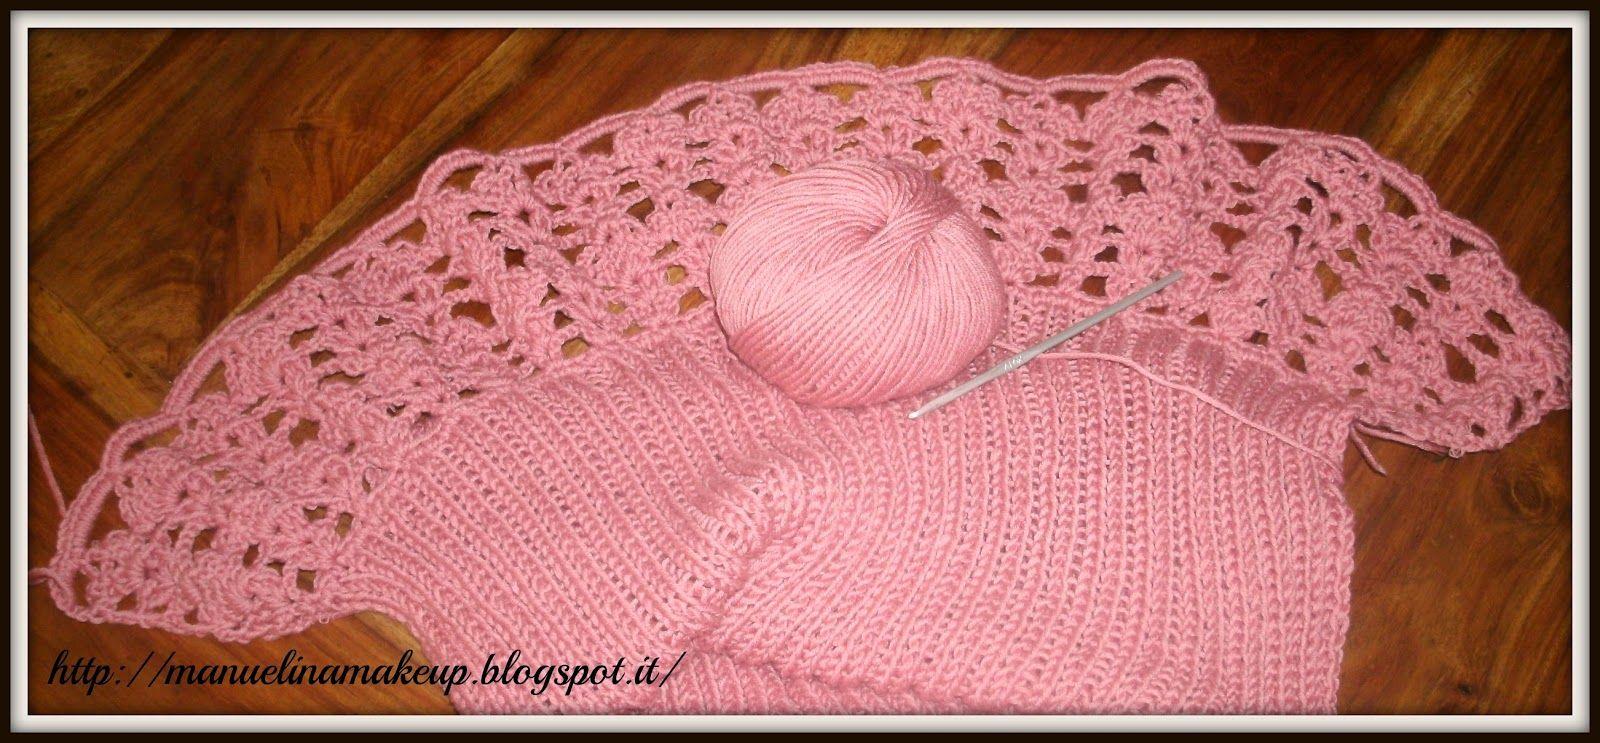 "Lovely shoulderwarmer made in Adriafil Duo Comfort by following ""Reno"" pattern; download it online at the following link: http://www.adriafil.com/html/img/riviste/mag41/modelli/file_istruzioni/uk/41Coordinato_Reno.pdf from ""Il Blog di Manu : moda""  #adriafil #rosa #pink #rose #duocomfort #yarn #filato #yarns #madeinitaly #shoulderwarmer #coprispalle #modello #pattern #knitwear #knit #knitting #crochet #crocheter #uncinetto #moda #fashion #trends #creatività #blog #blogger #woolblend"